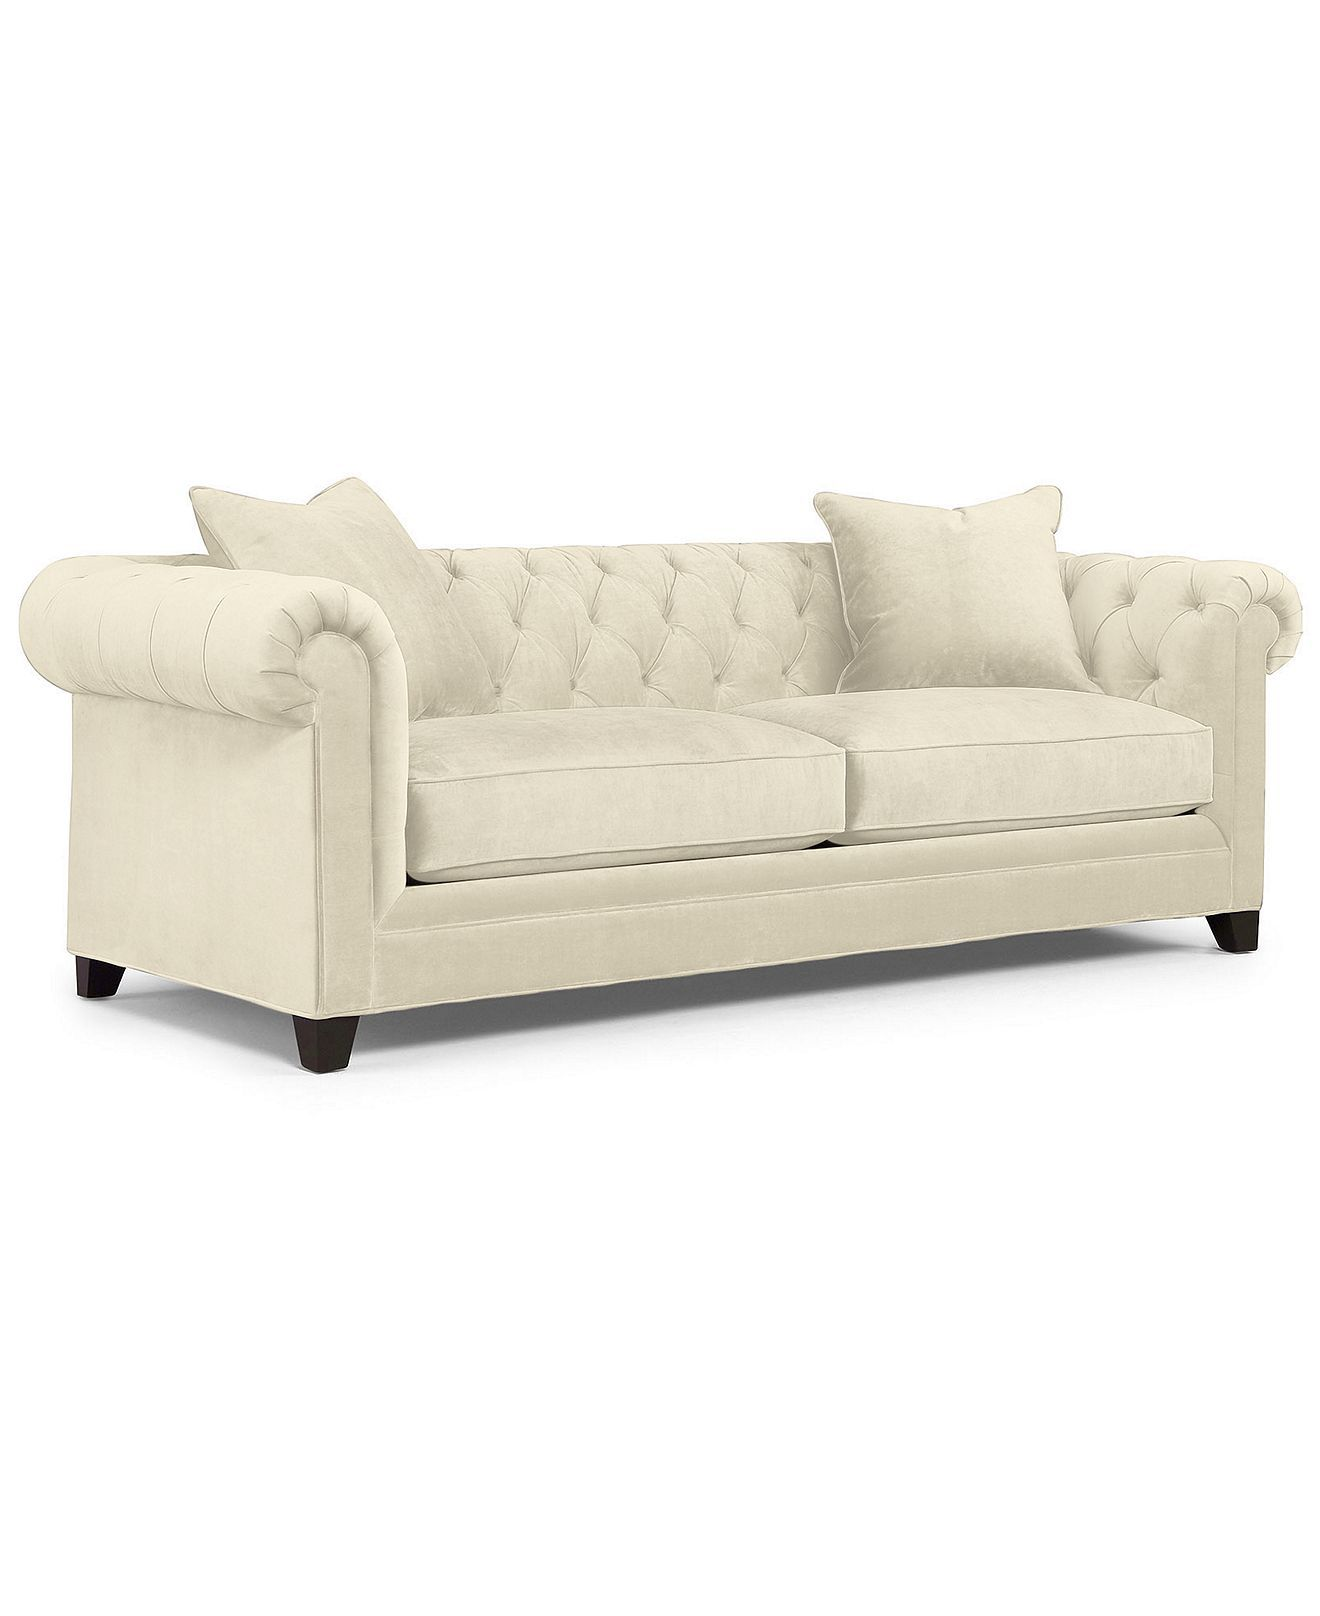 Martha Stewart Saybridge Sofa In Cocoa Vintage Honey Or